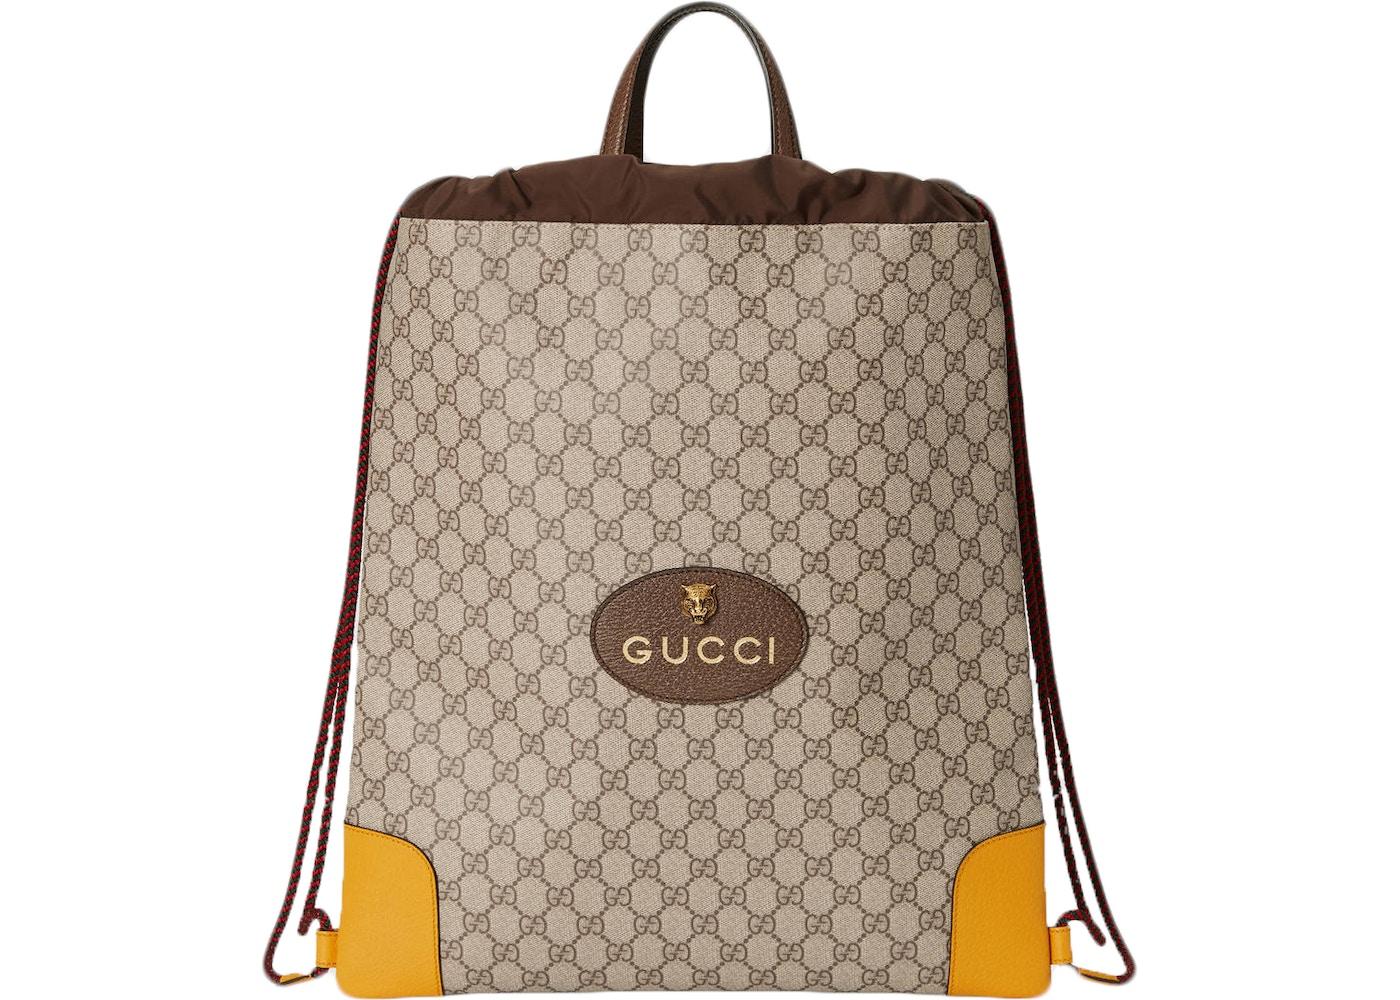 ed08b9c5801 Gucci Drawstring Backpack GG Supreme Beige Yellow. GG Supreme Beige Yellow